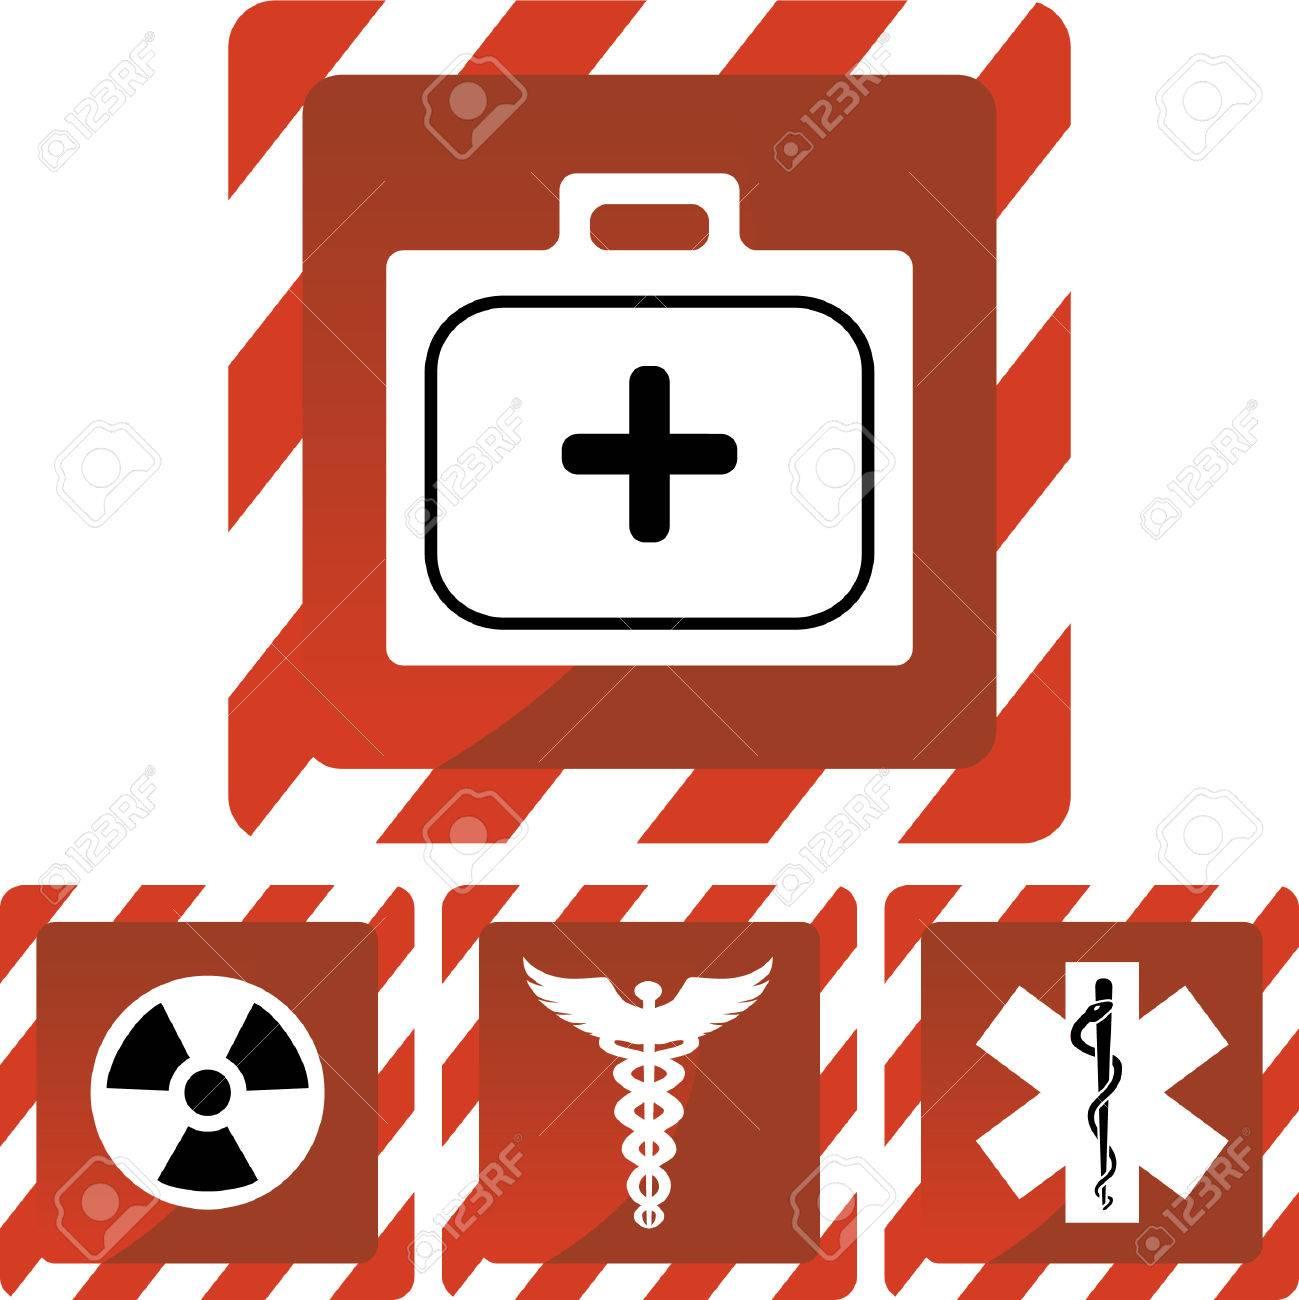 medical alert royalty free cliparts vectors and stock illustration rh 123rf com EPS Medical Alert Symbol Reminder Alert Clip Art